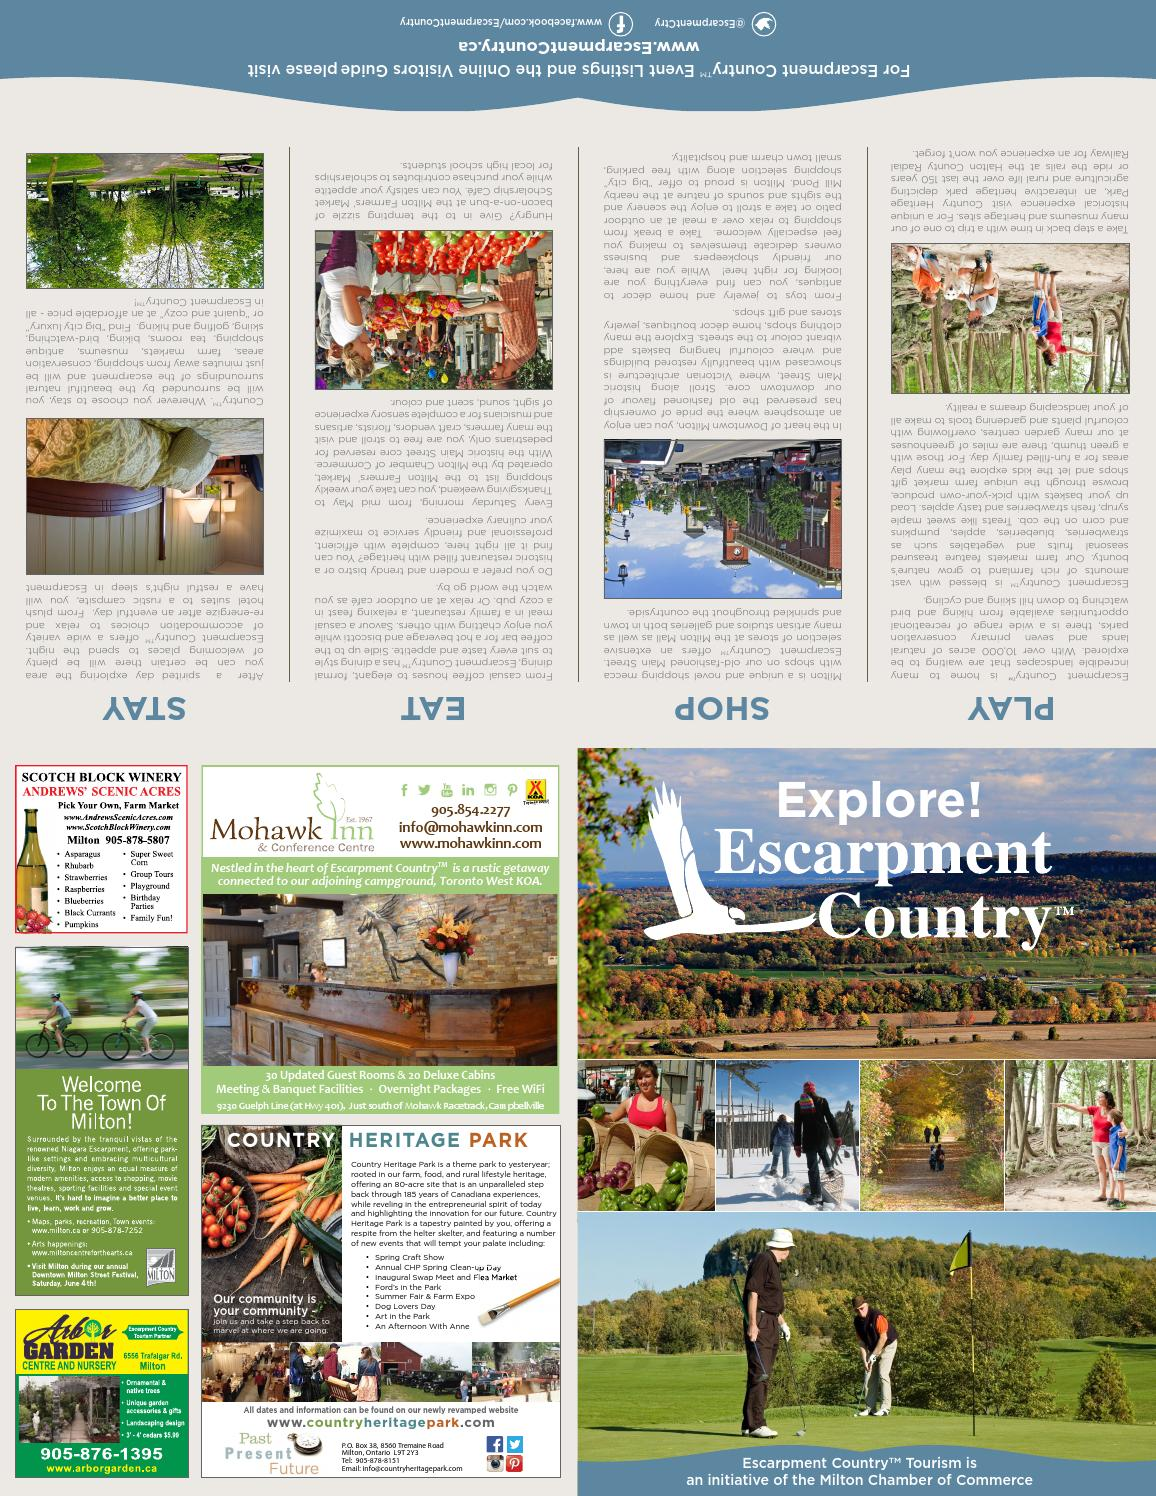 Explore Escarpment Country Brochure 2016